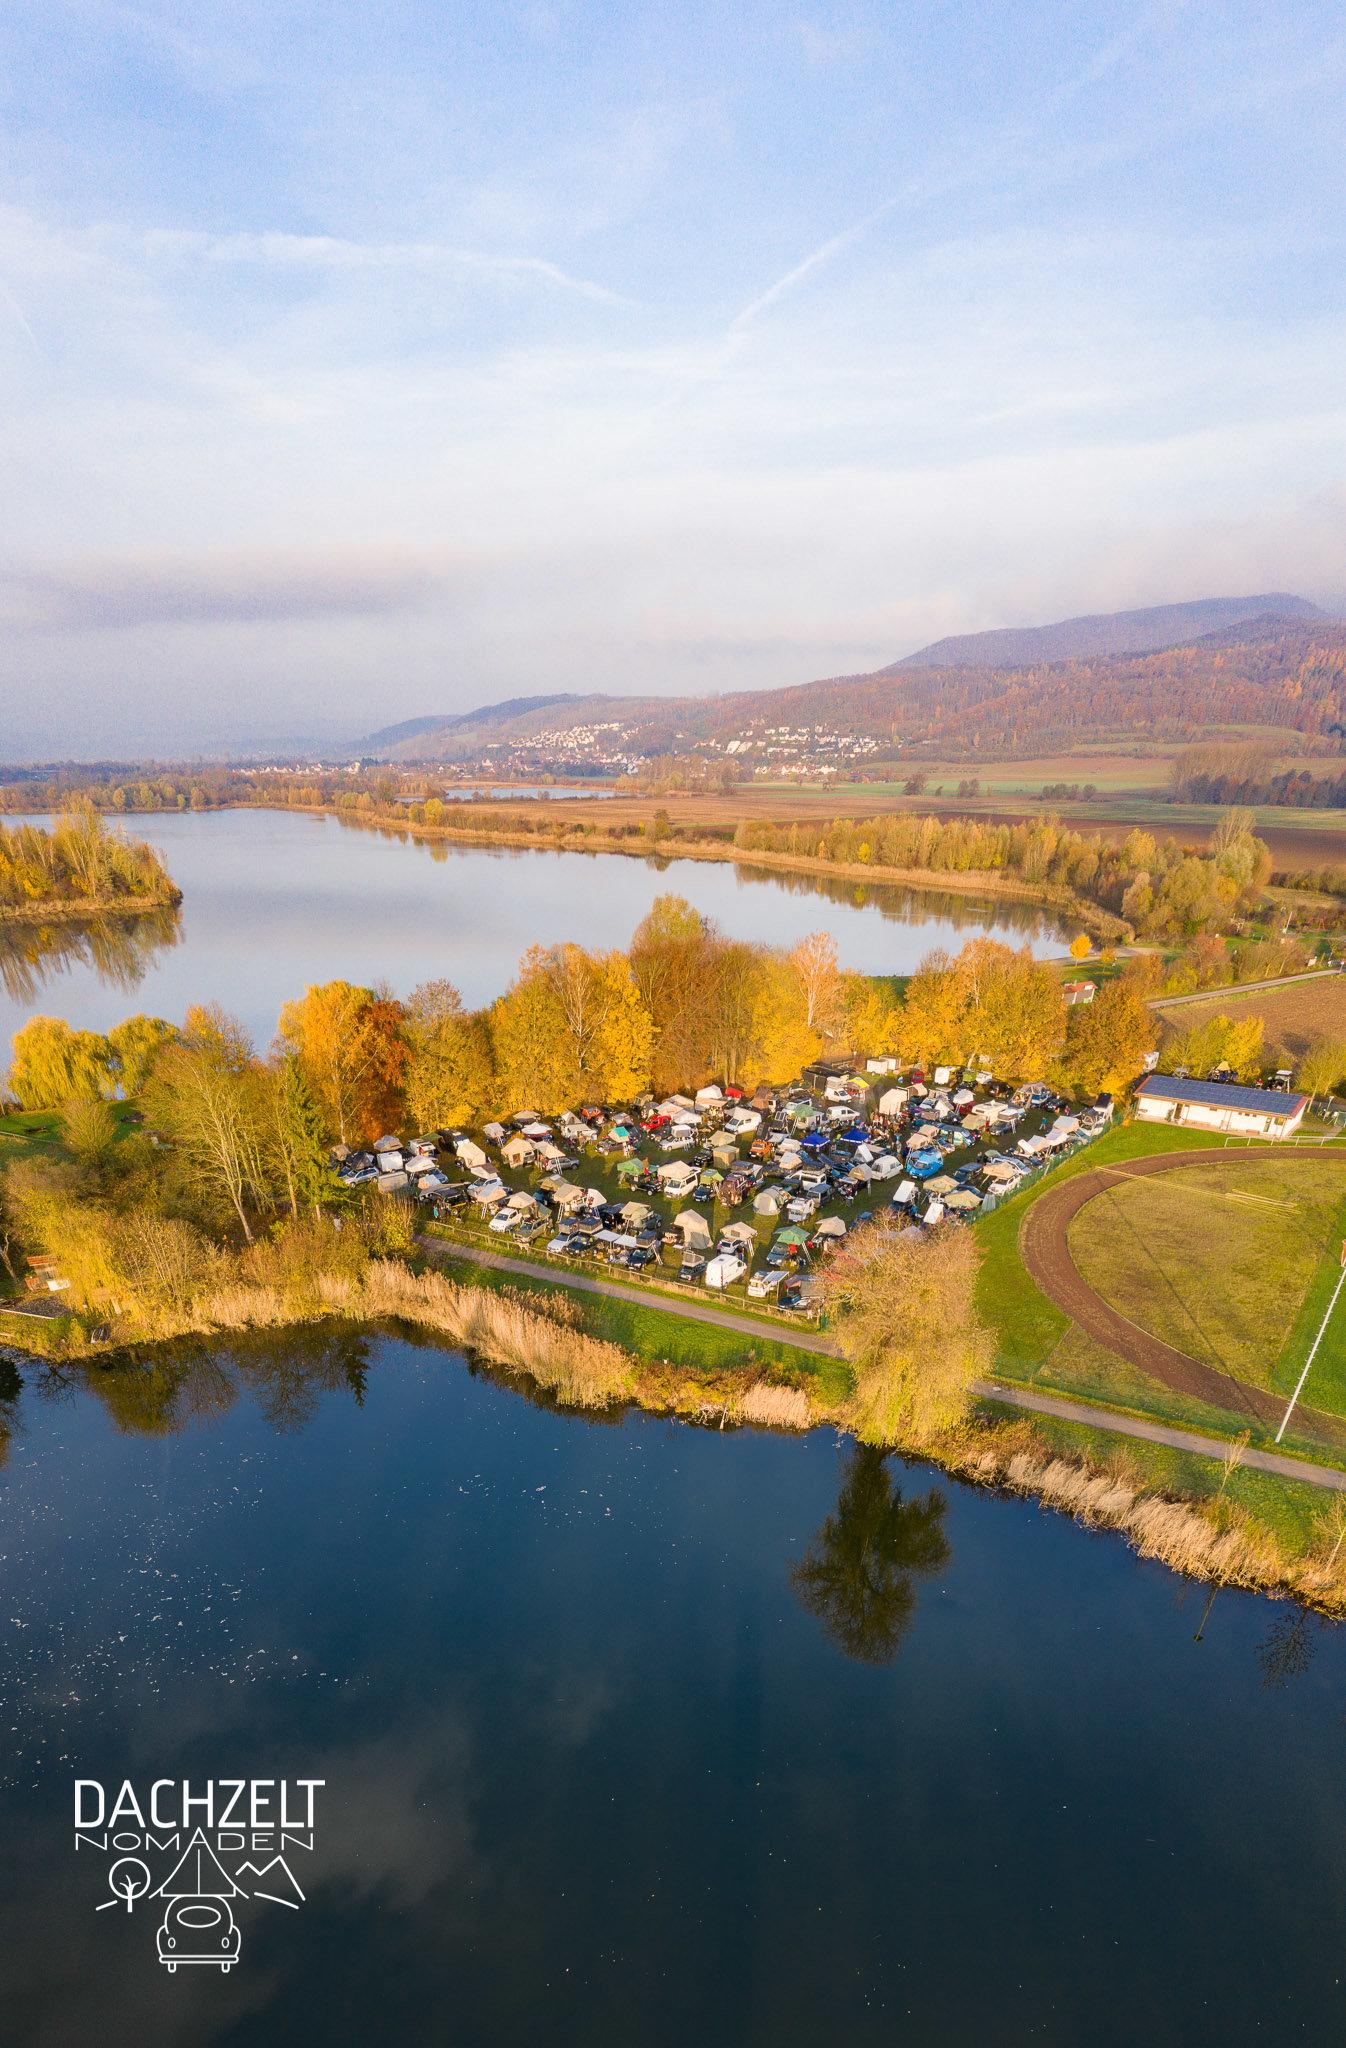 20191123-DACHZELT-MEETUP-NORDHESSEN-Thilo-Vogel-DJI 0832-Pano